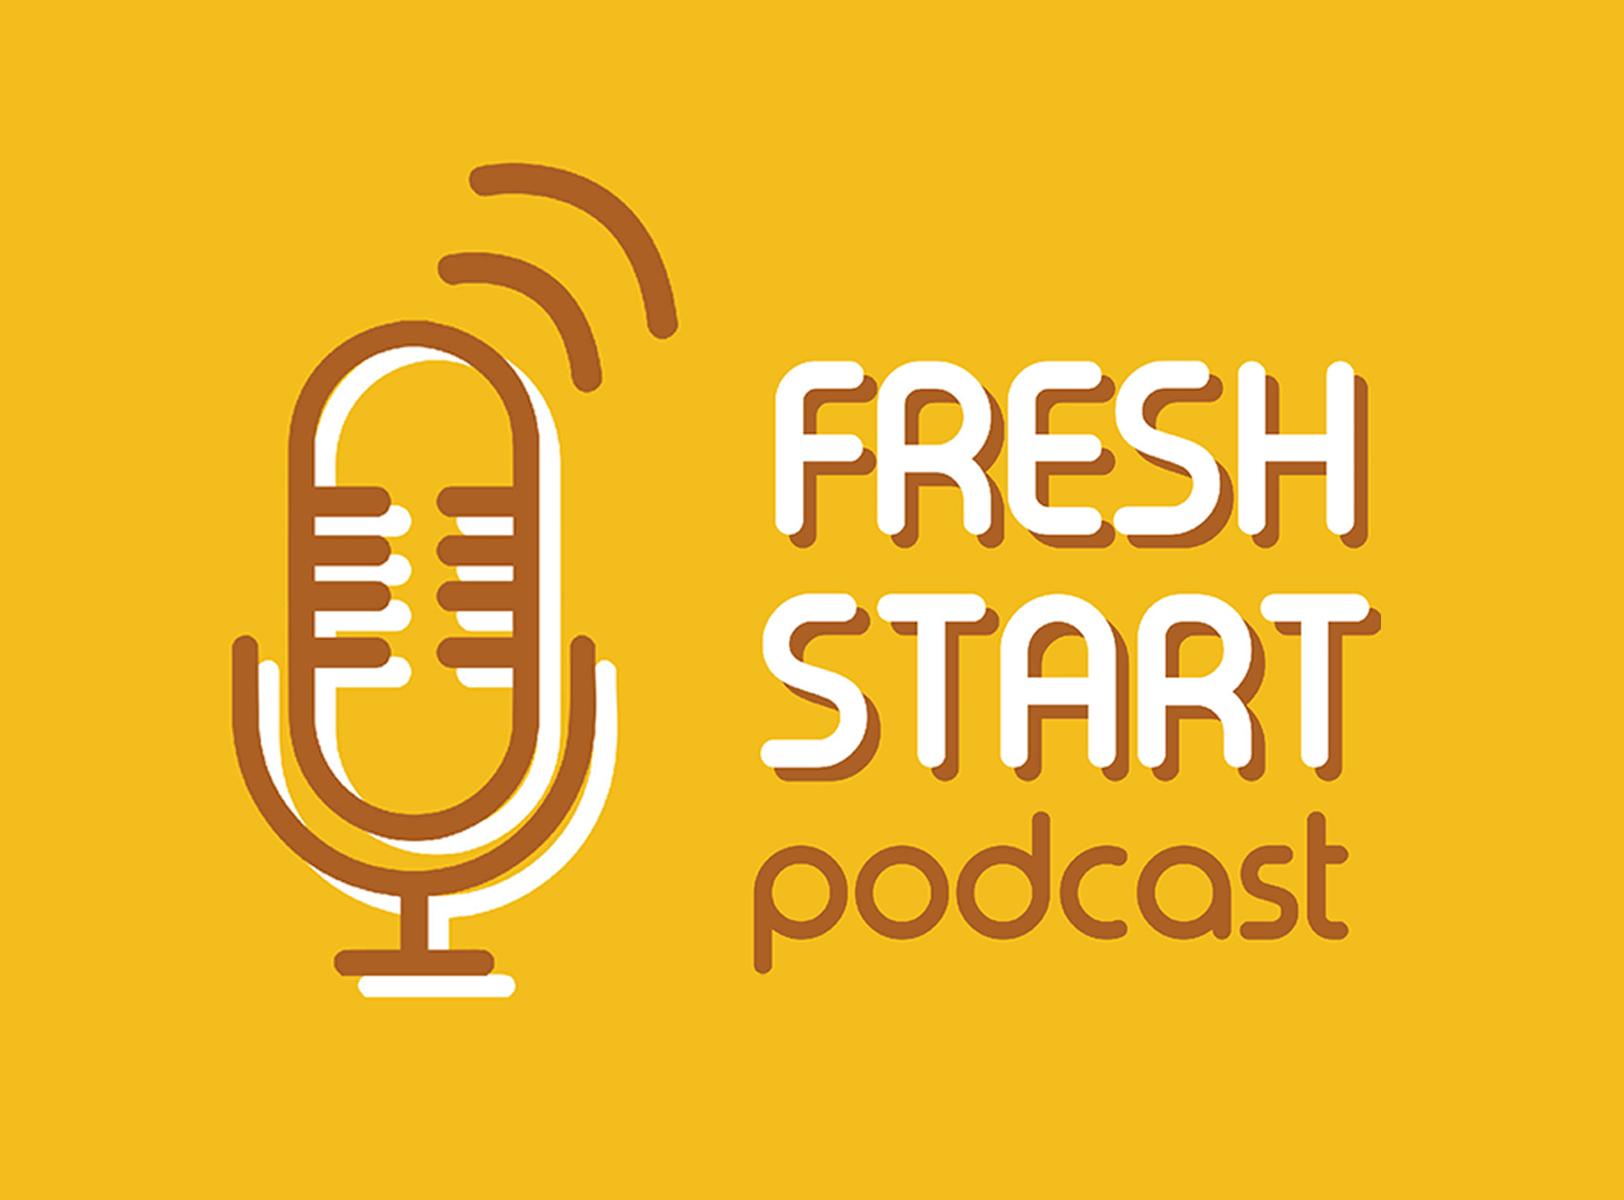 Fresh Start: Podcast News (11/28/2019 Thu.)